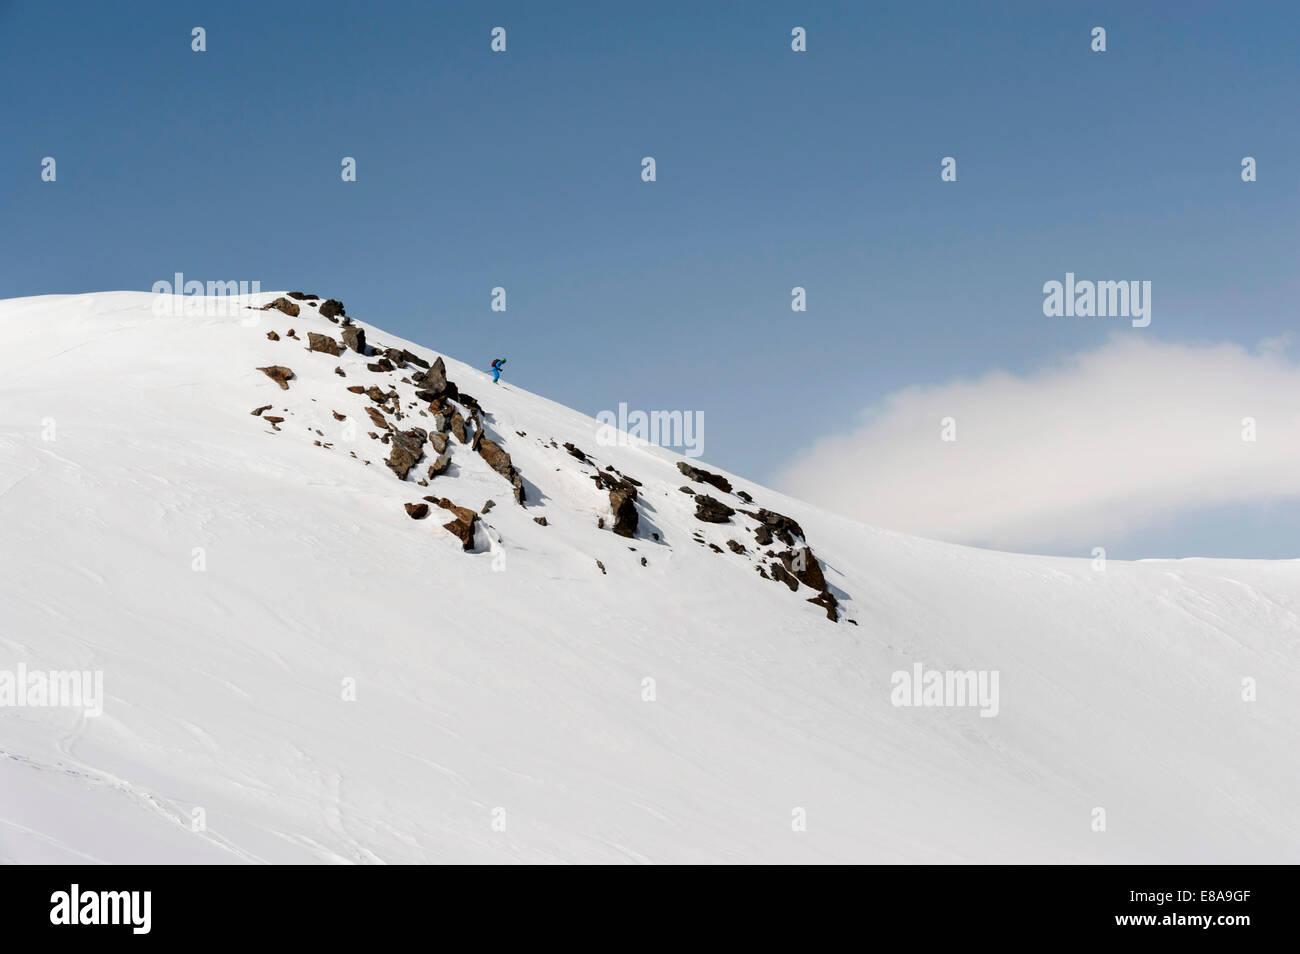 Man skiing downhill steep ski slope Alps - Stock Image